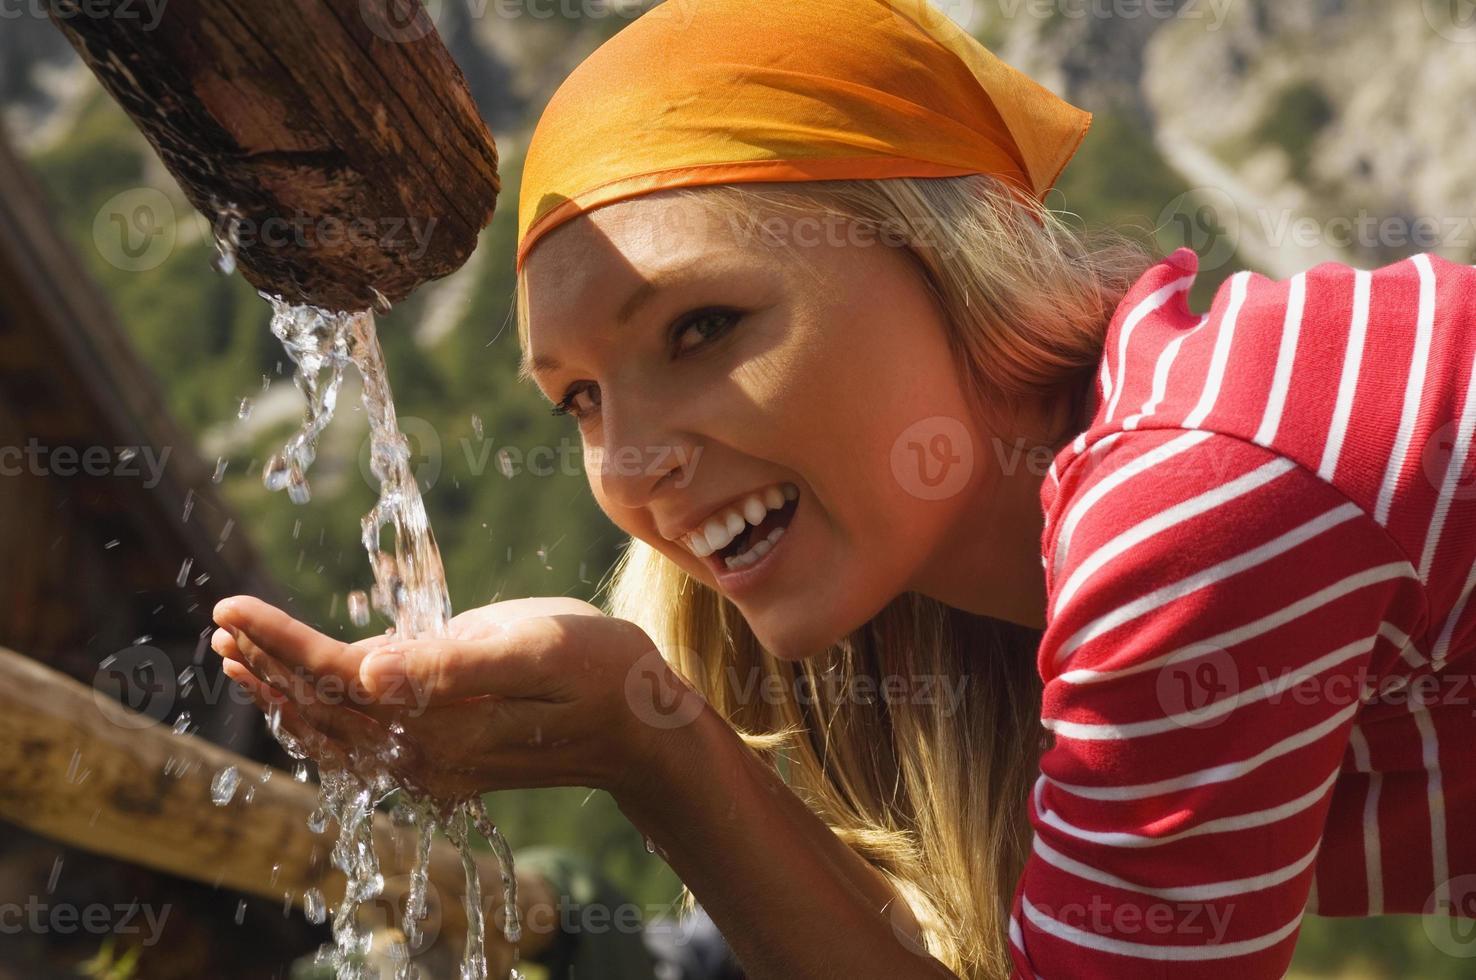 mulher loira bebendo água, retrato foto